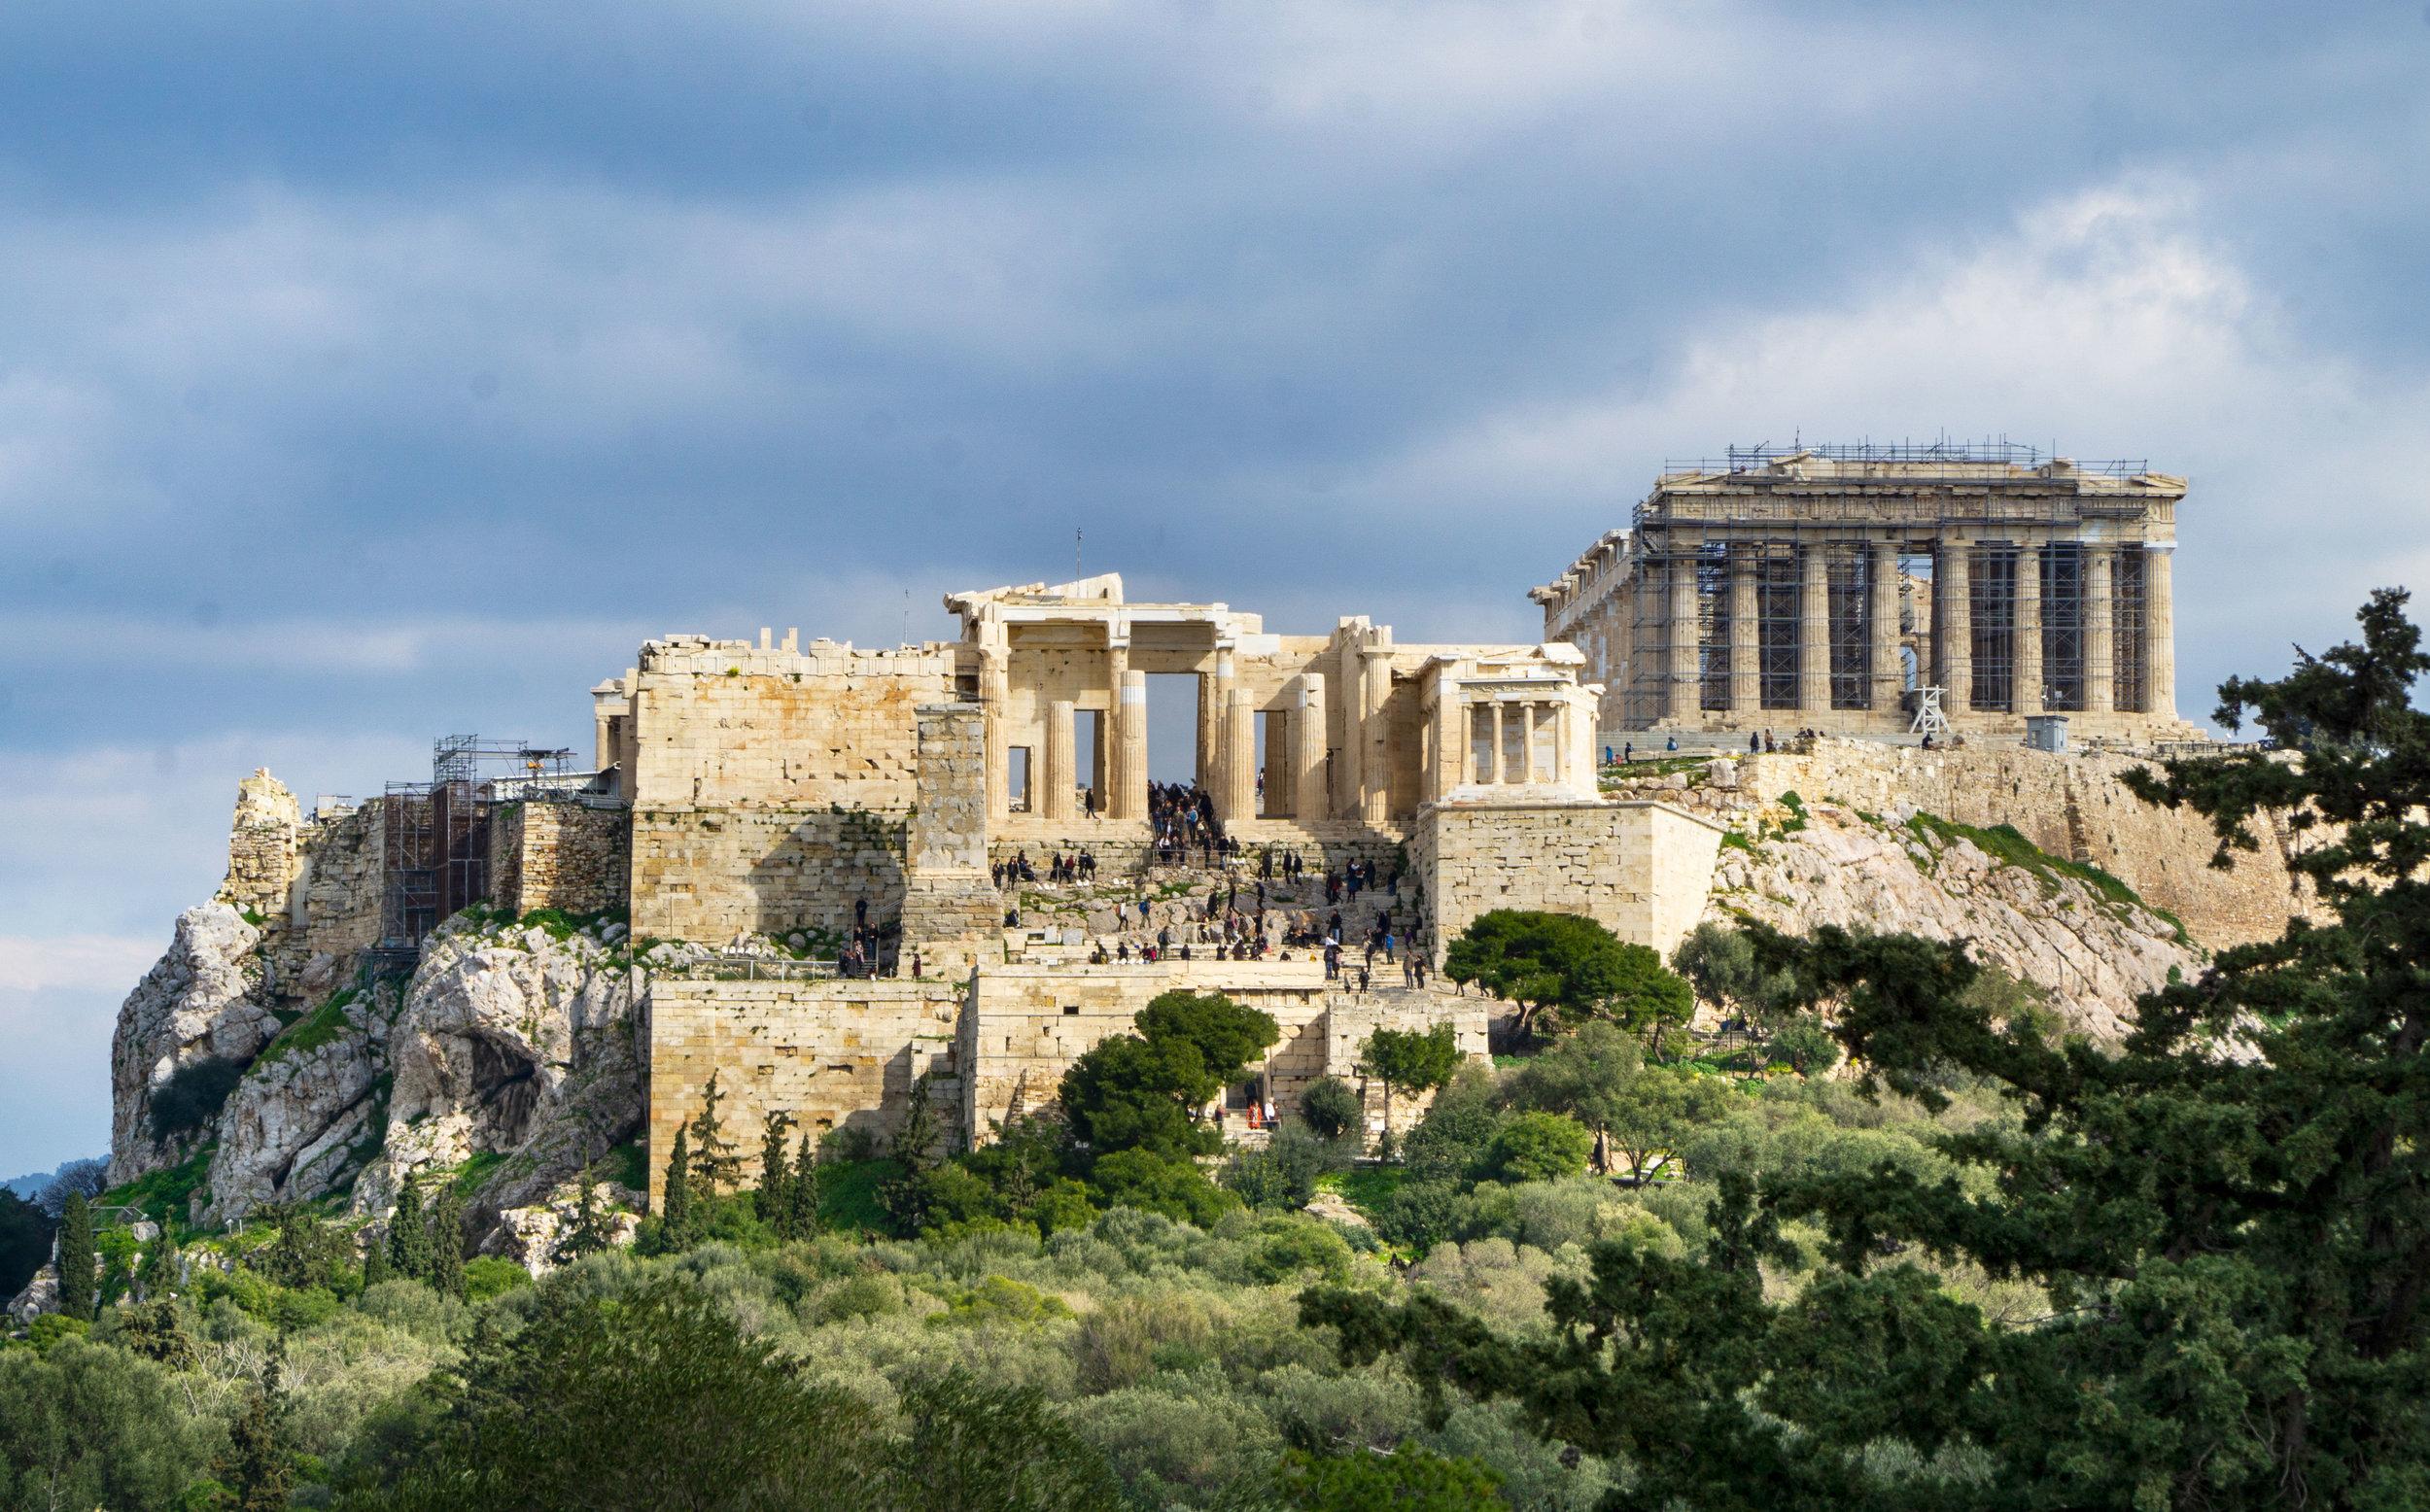 athens_acropolis_vickygood_travel_photography5sm.jpg